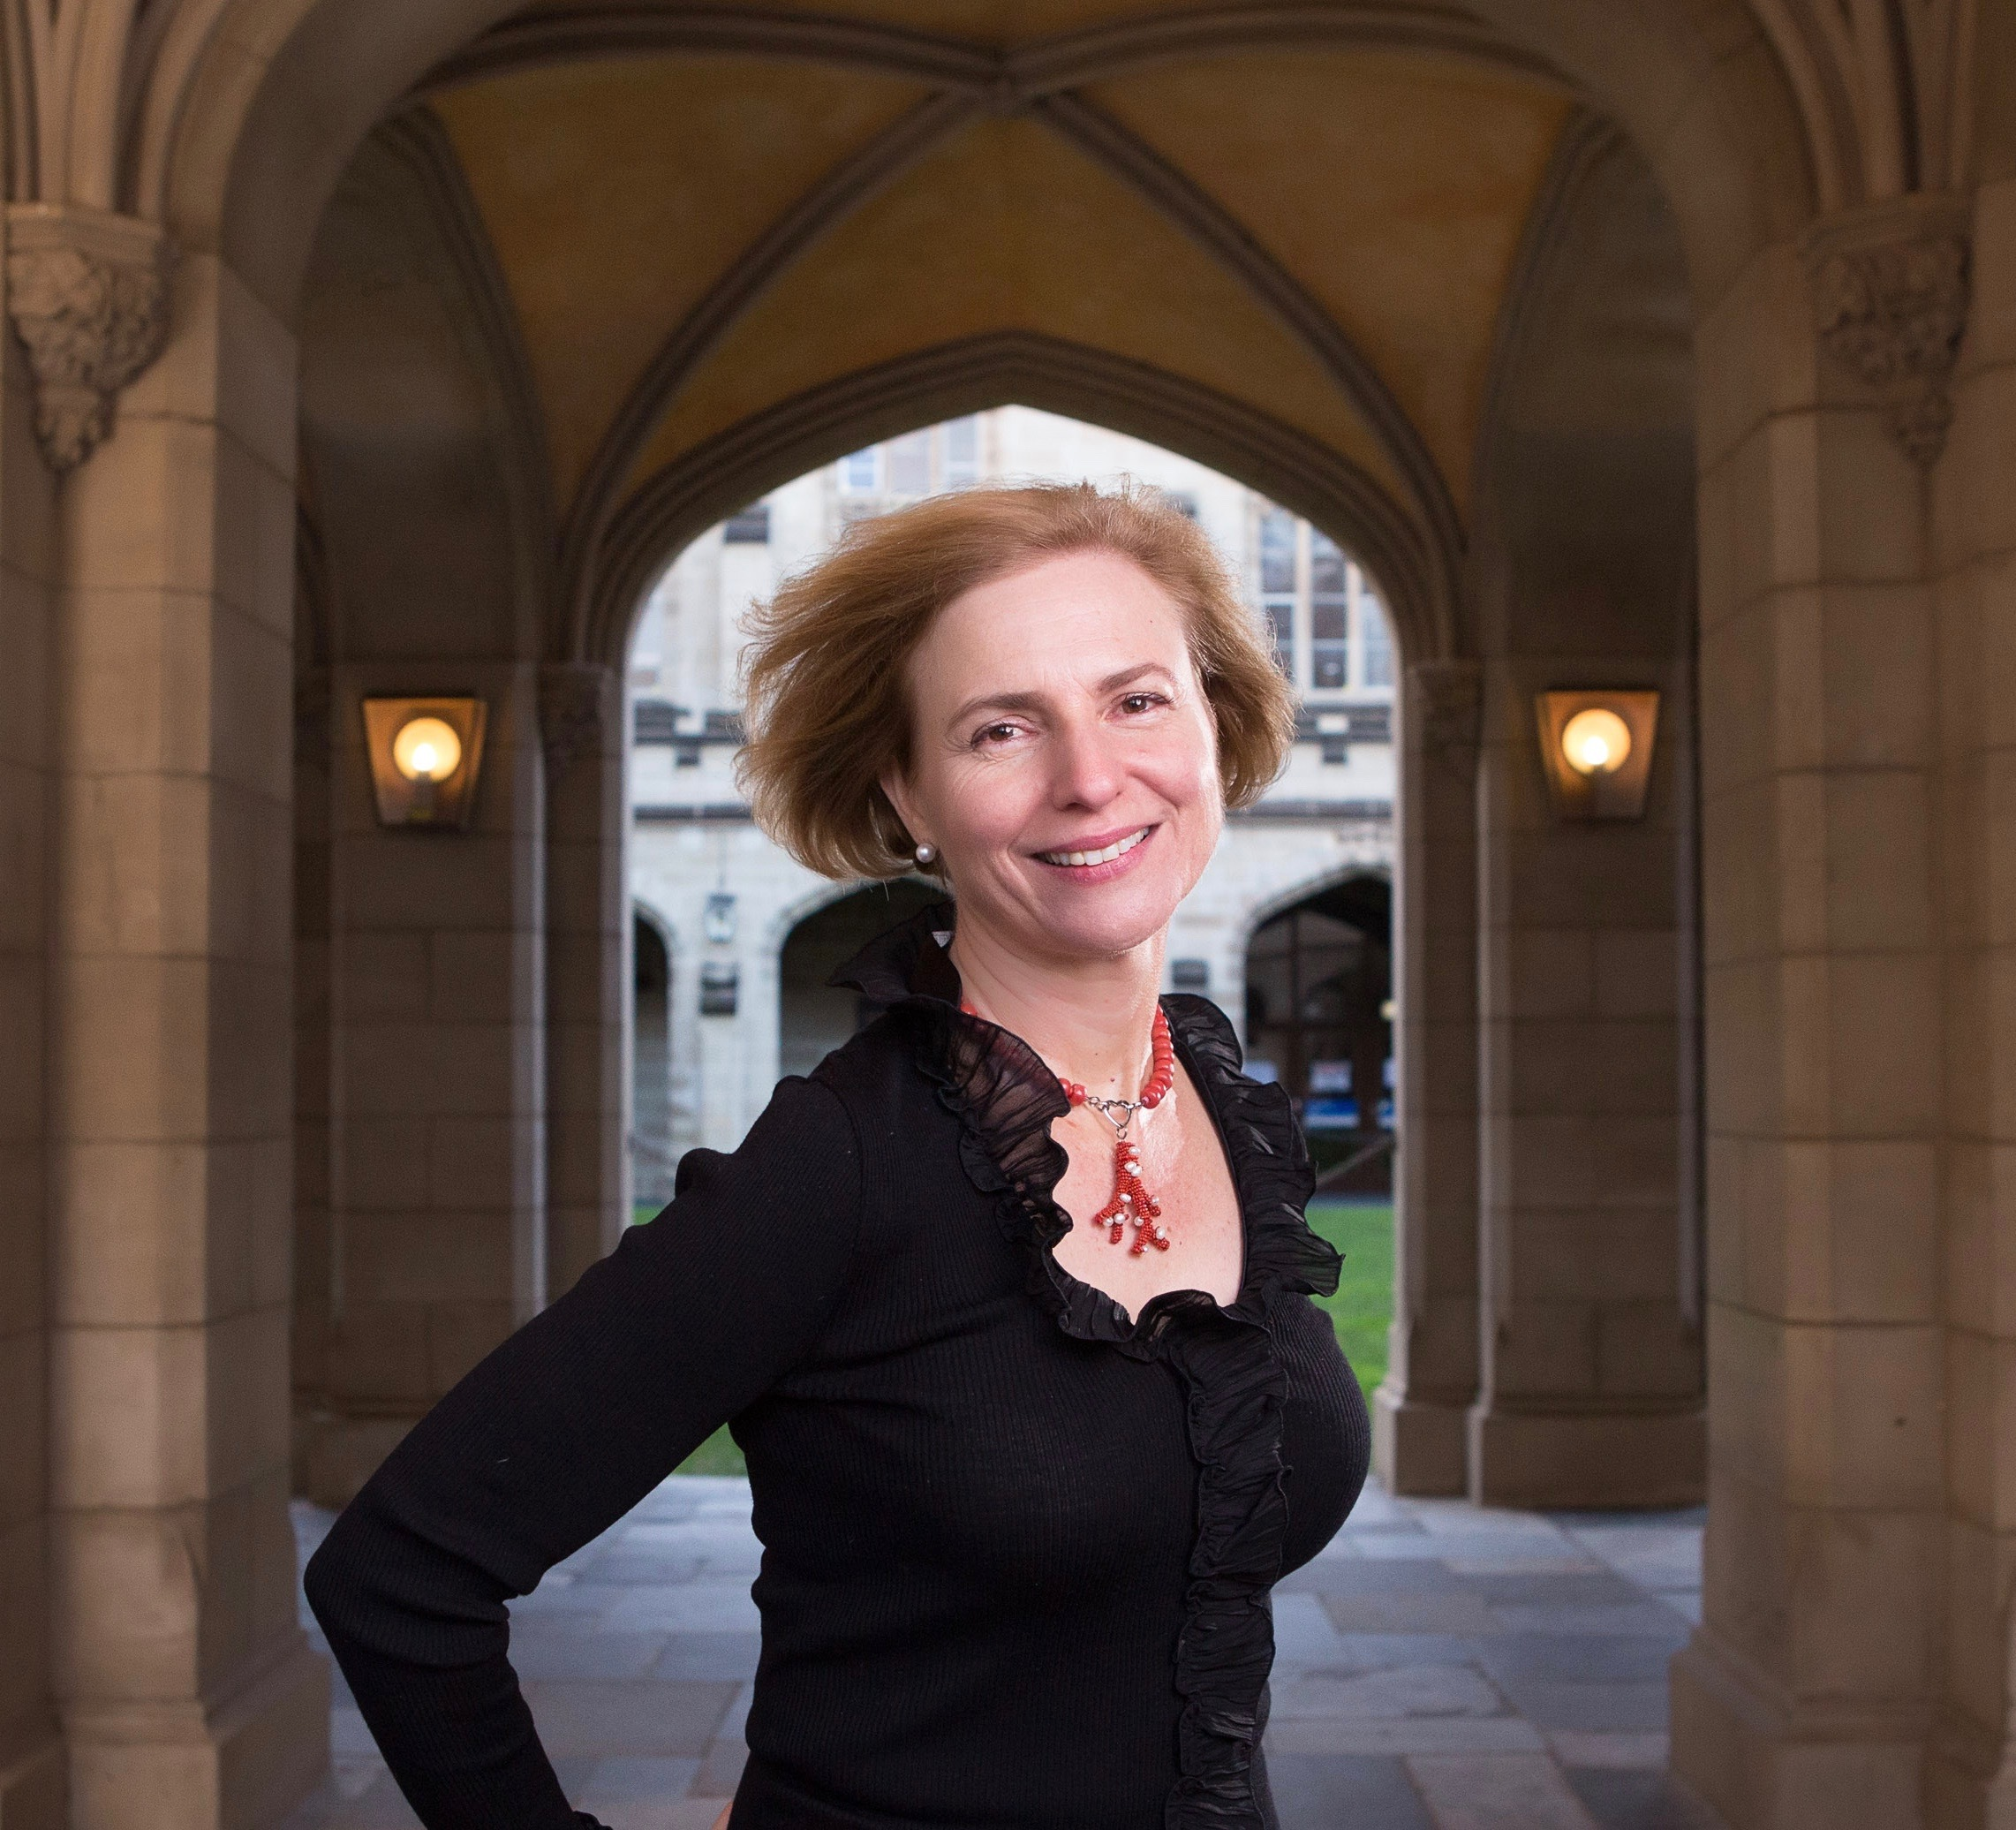 Profile picture of Catherine Kovesi